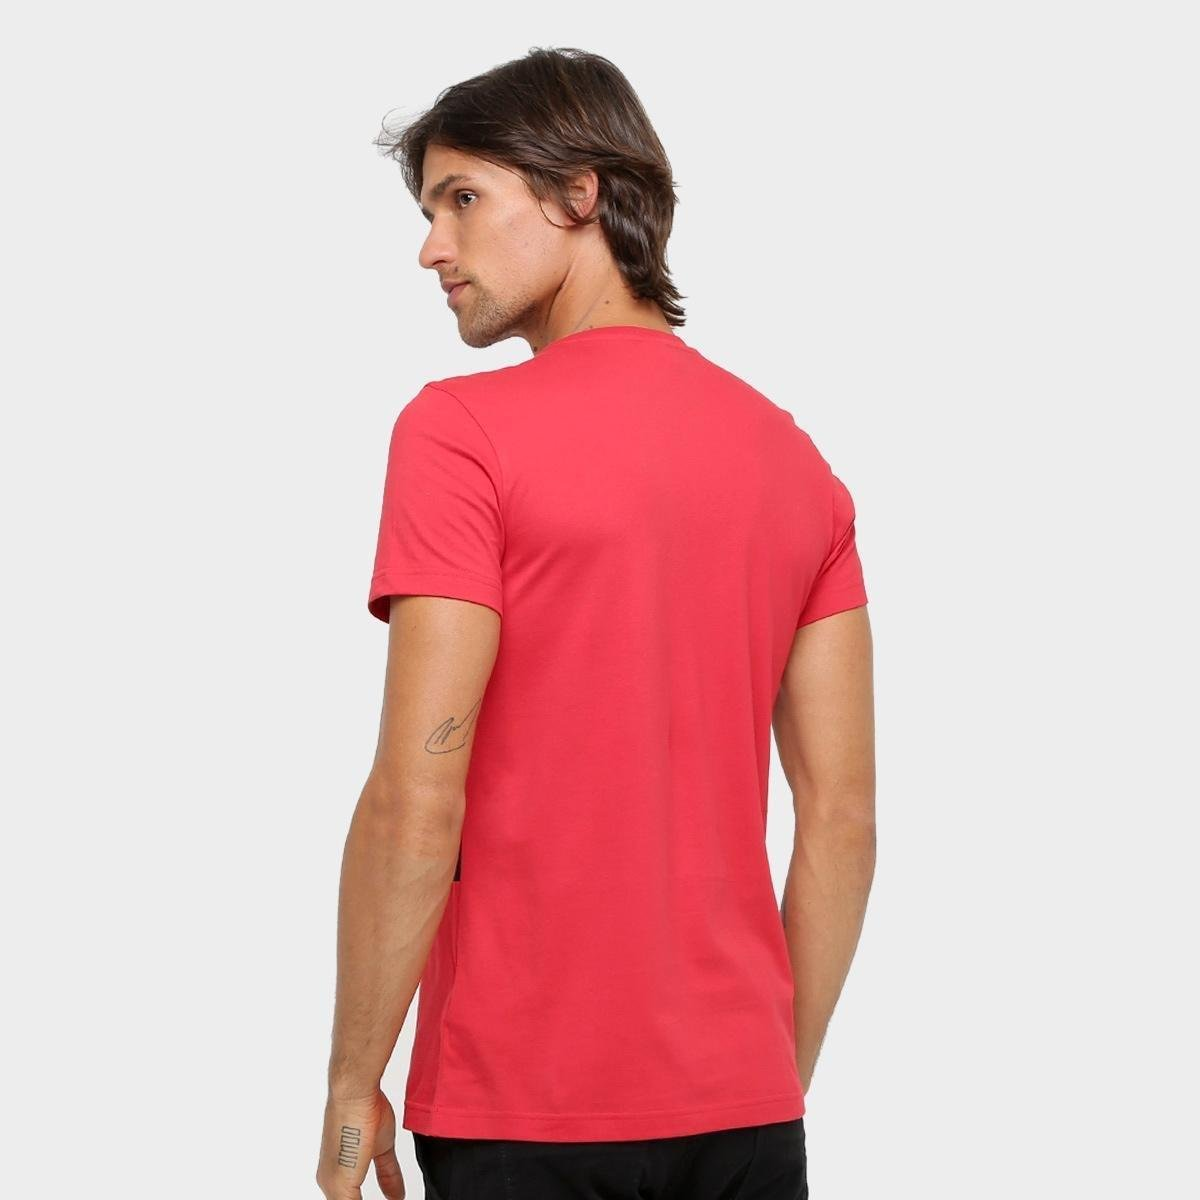 Camiseta Flamengo Adidas Grafica Masculina  Camiseta Flamengo Adidas  Grafica Masculina ... 817419806b61f